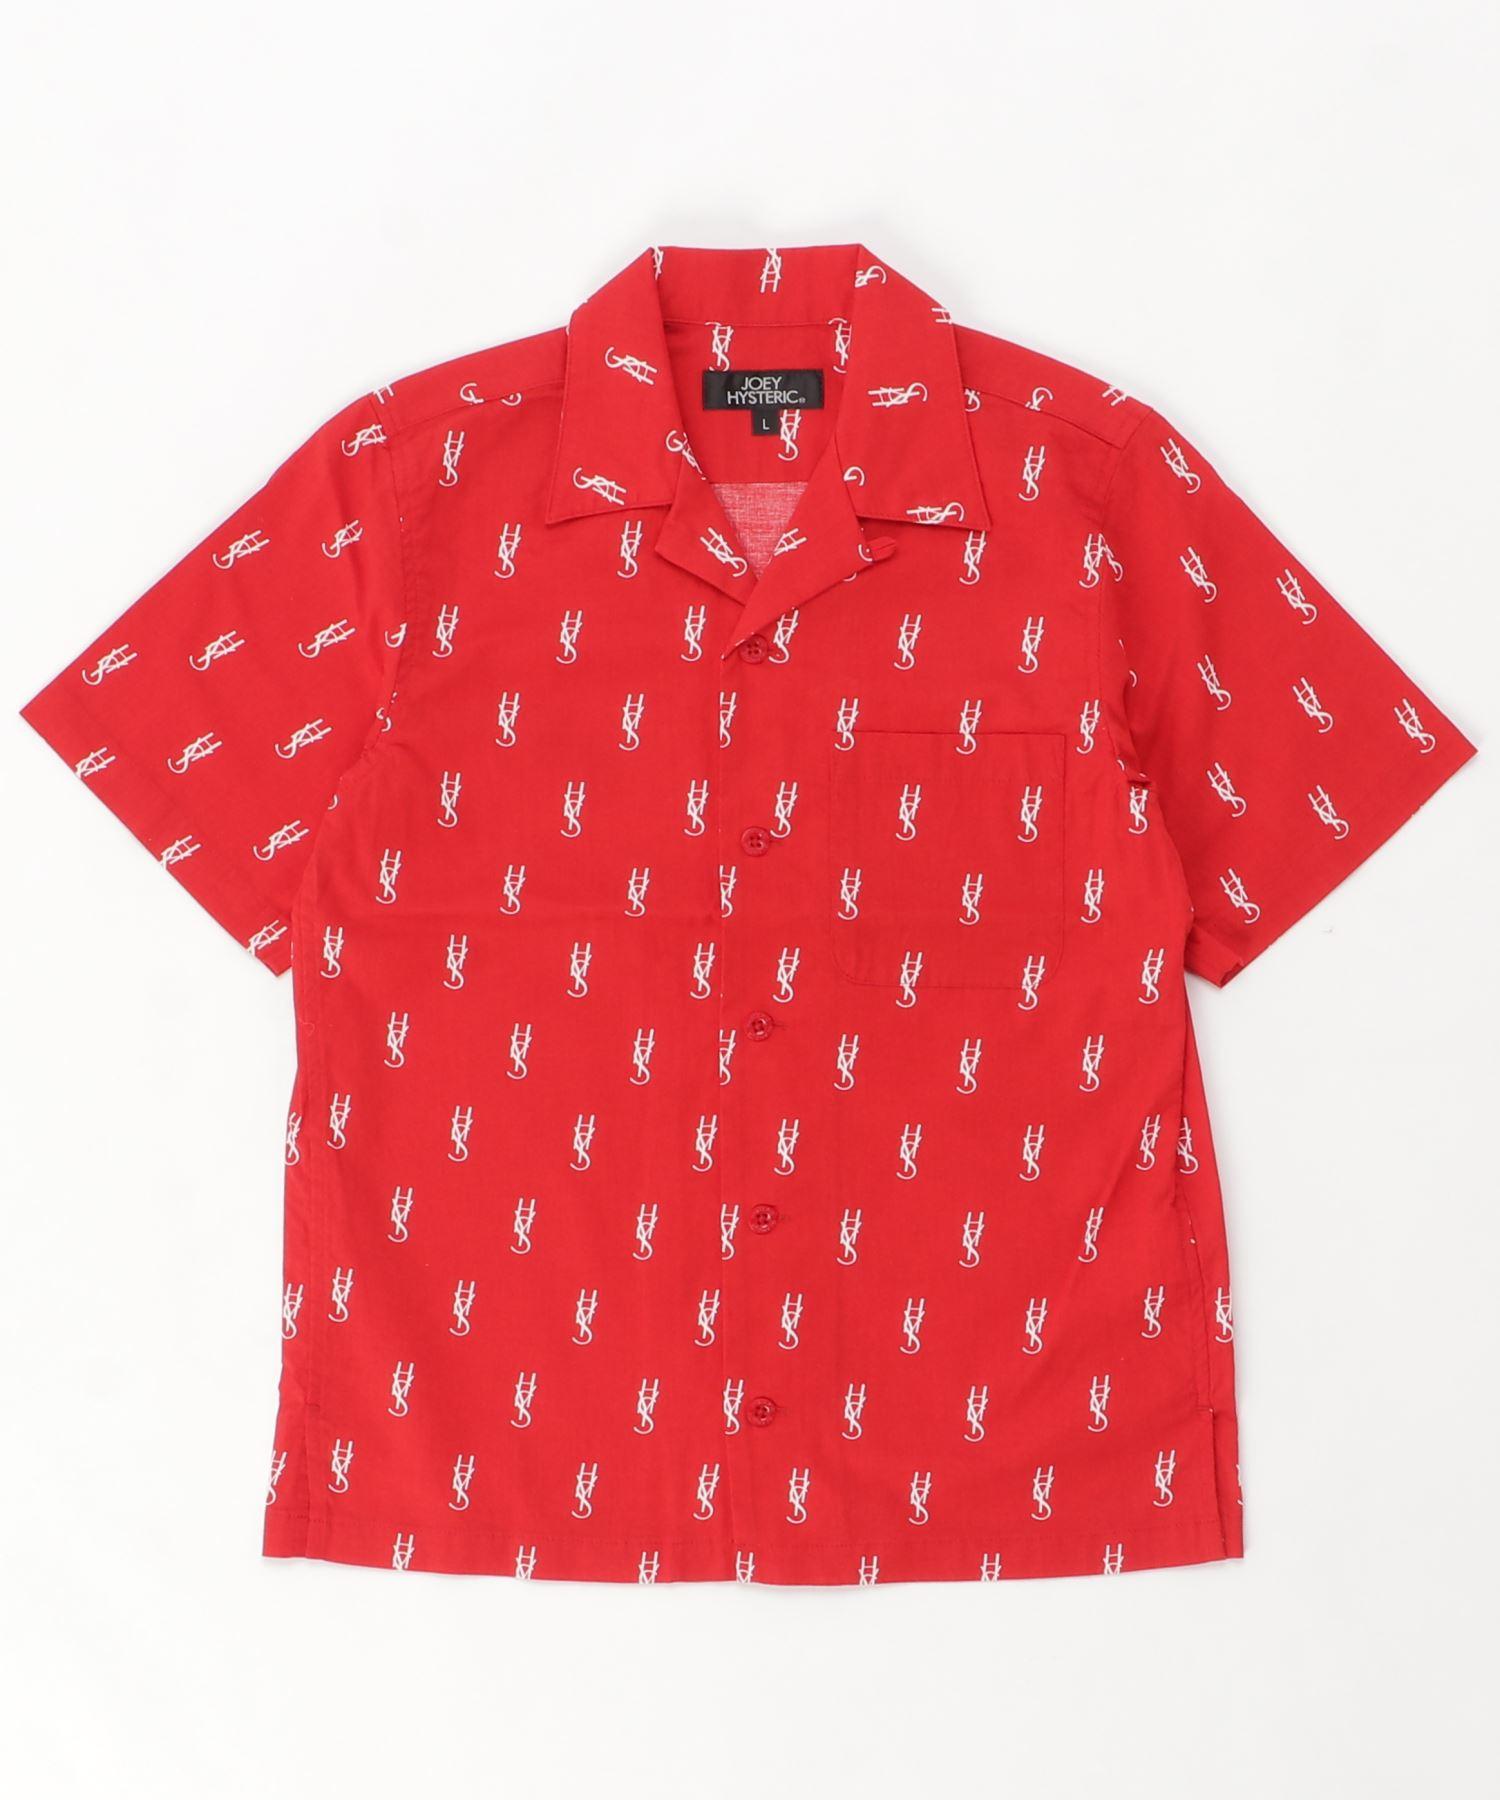 HYS MONOGRAM柄 オープンカラーシャツ【L】